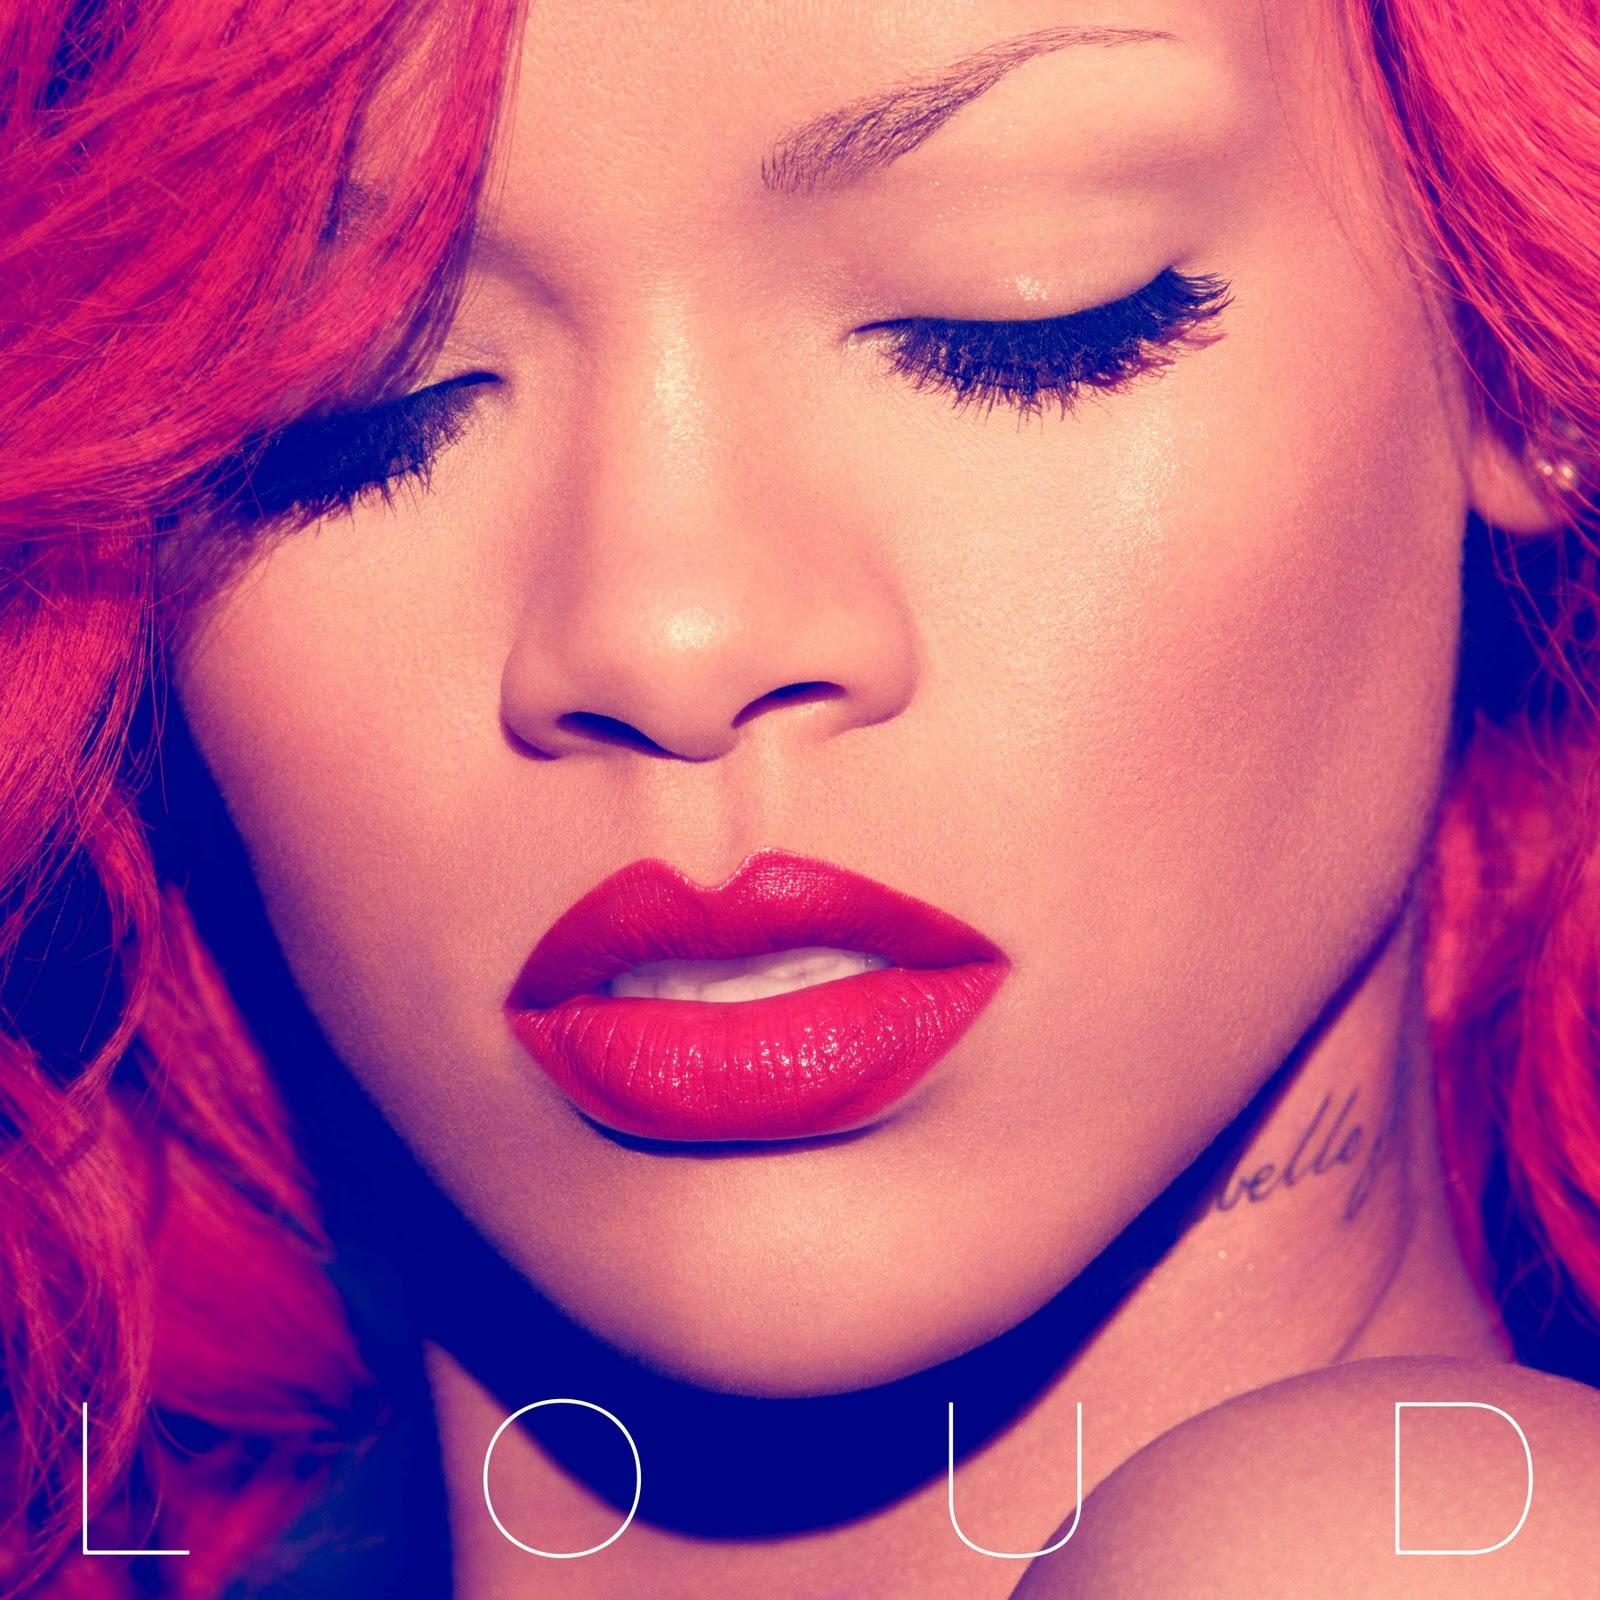 http://2.bp.blogspot.com/_ALNcsPR9414/TNNoVuL-R_I/AAAAAAAABTQ/aEkS4S_bINQ/s1600/Rihanna+-+Loud+(Official+Album+Cover).jpg